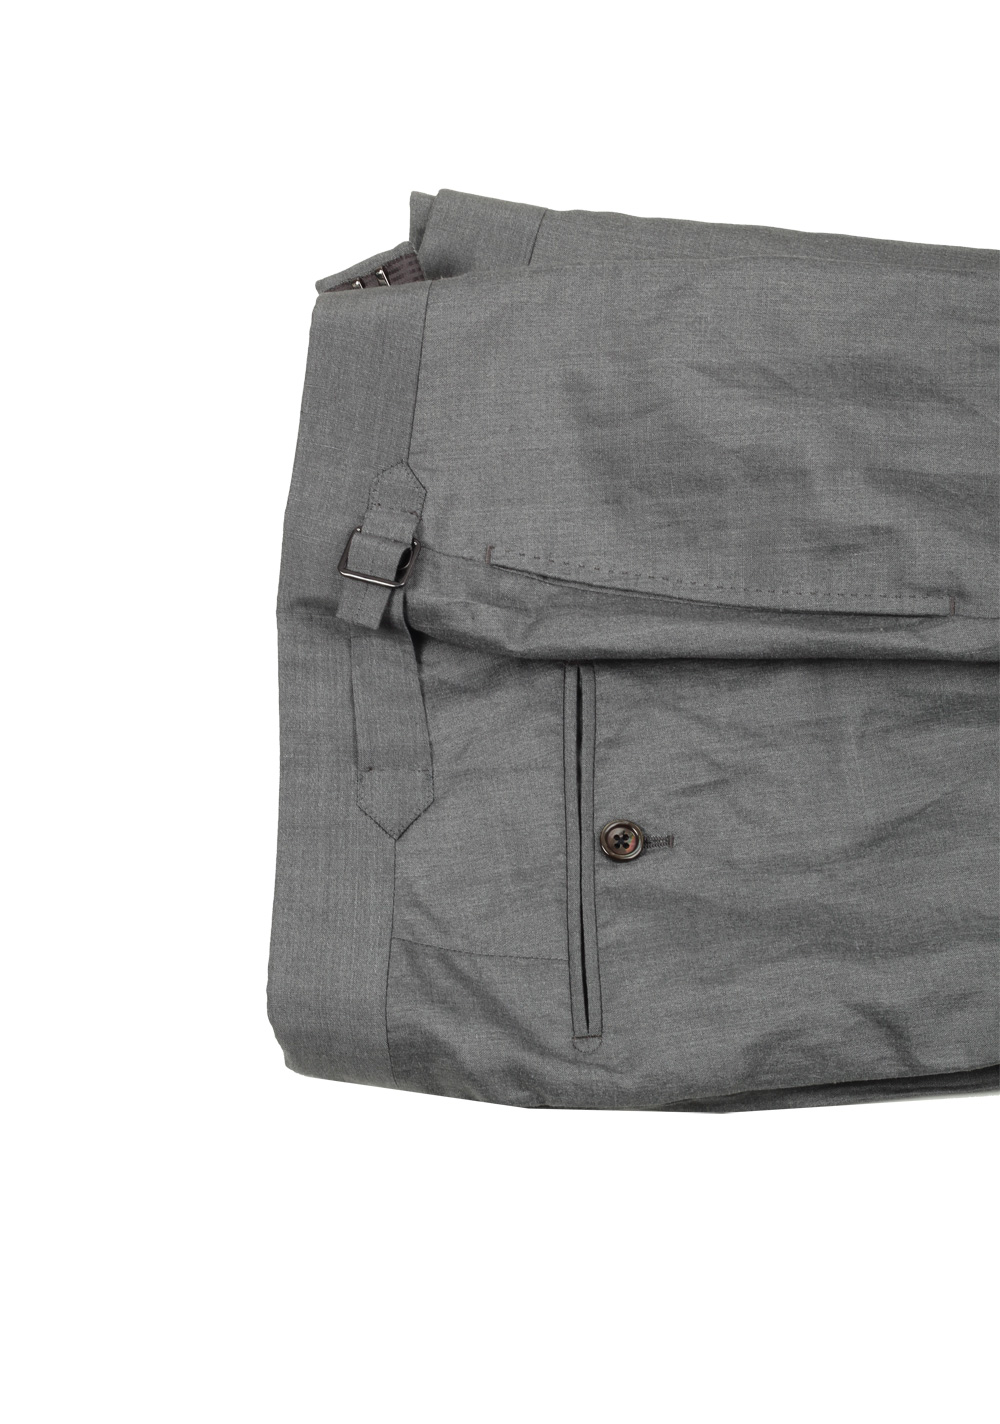 TOM FORD Shelton Gray Suit Size 46 / 36R U.S. In Linen Silk | Costume Limité